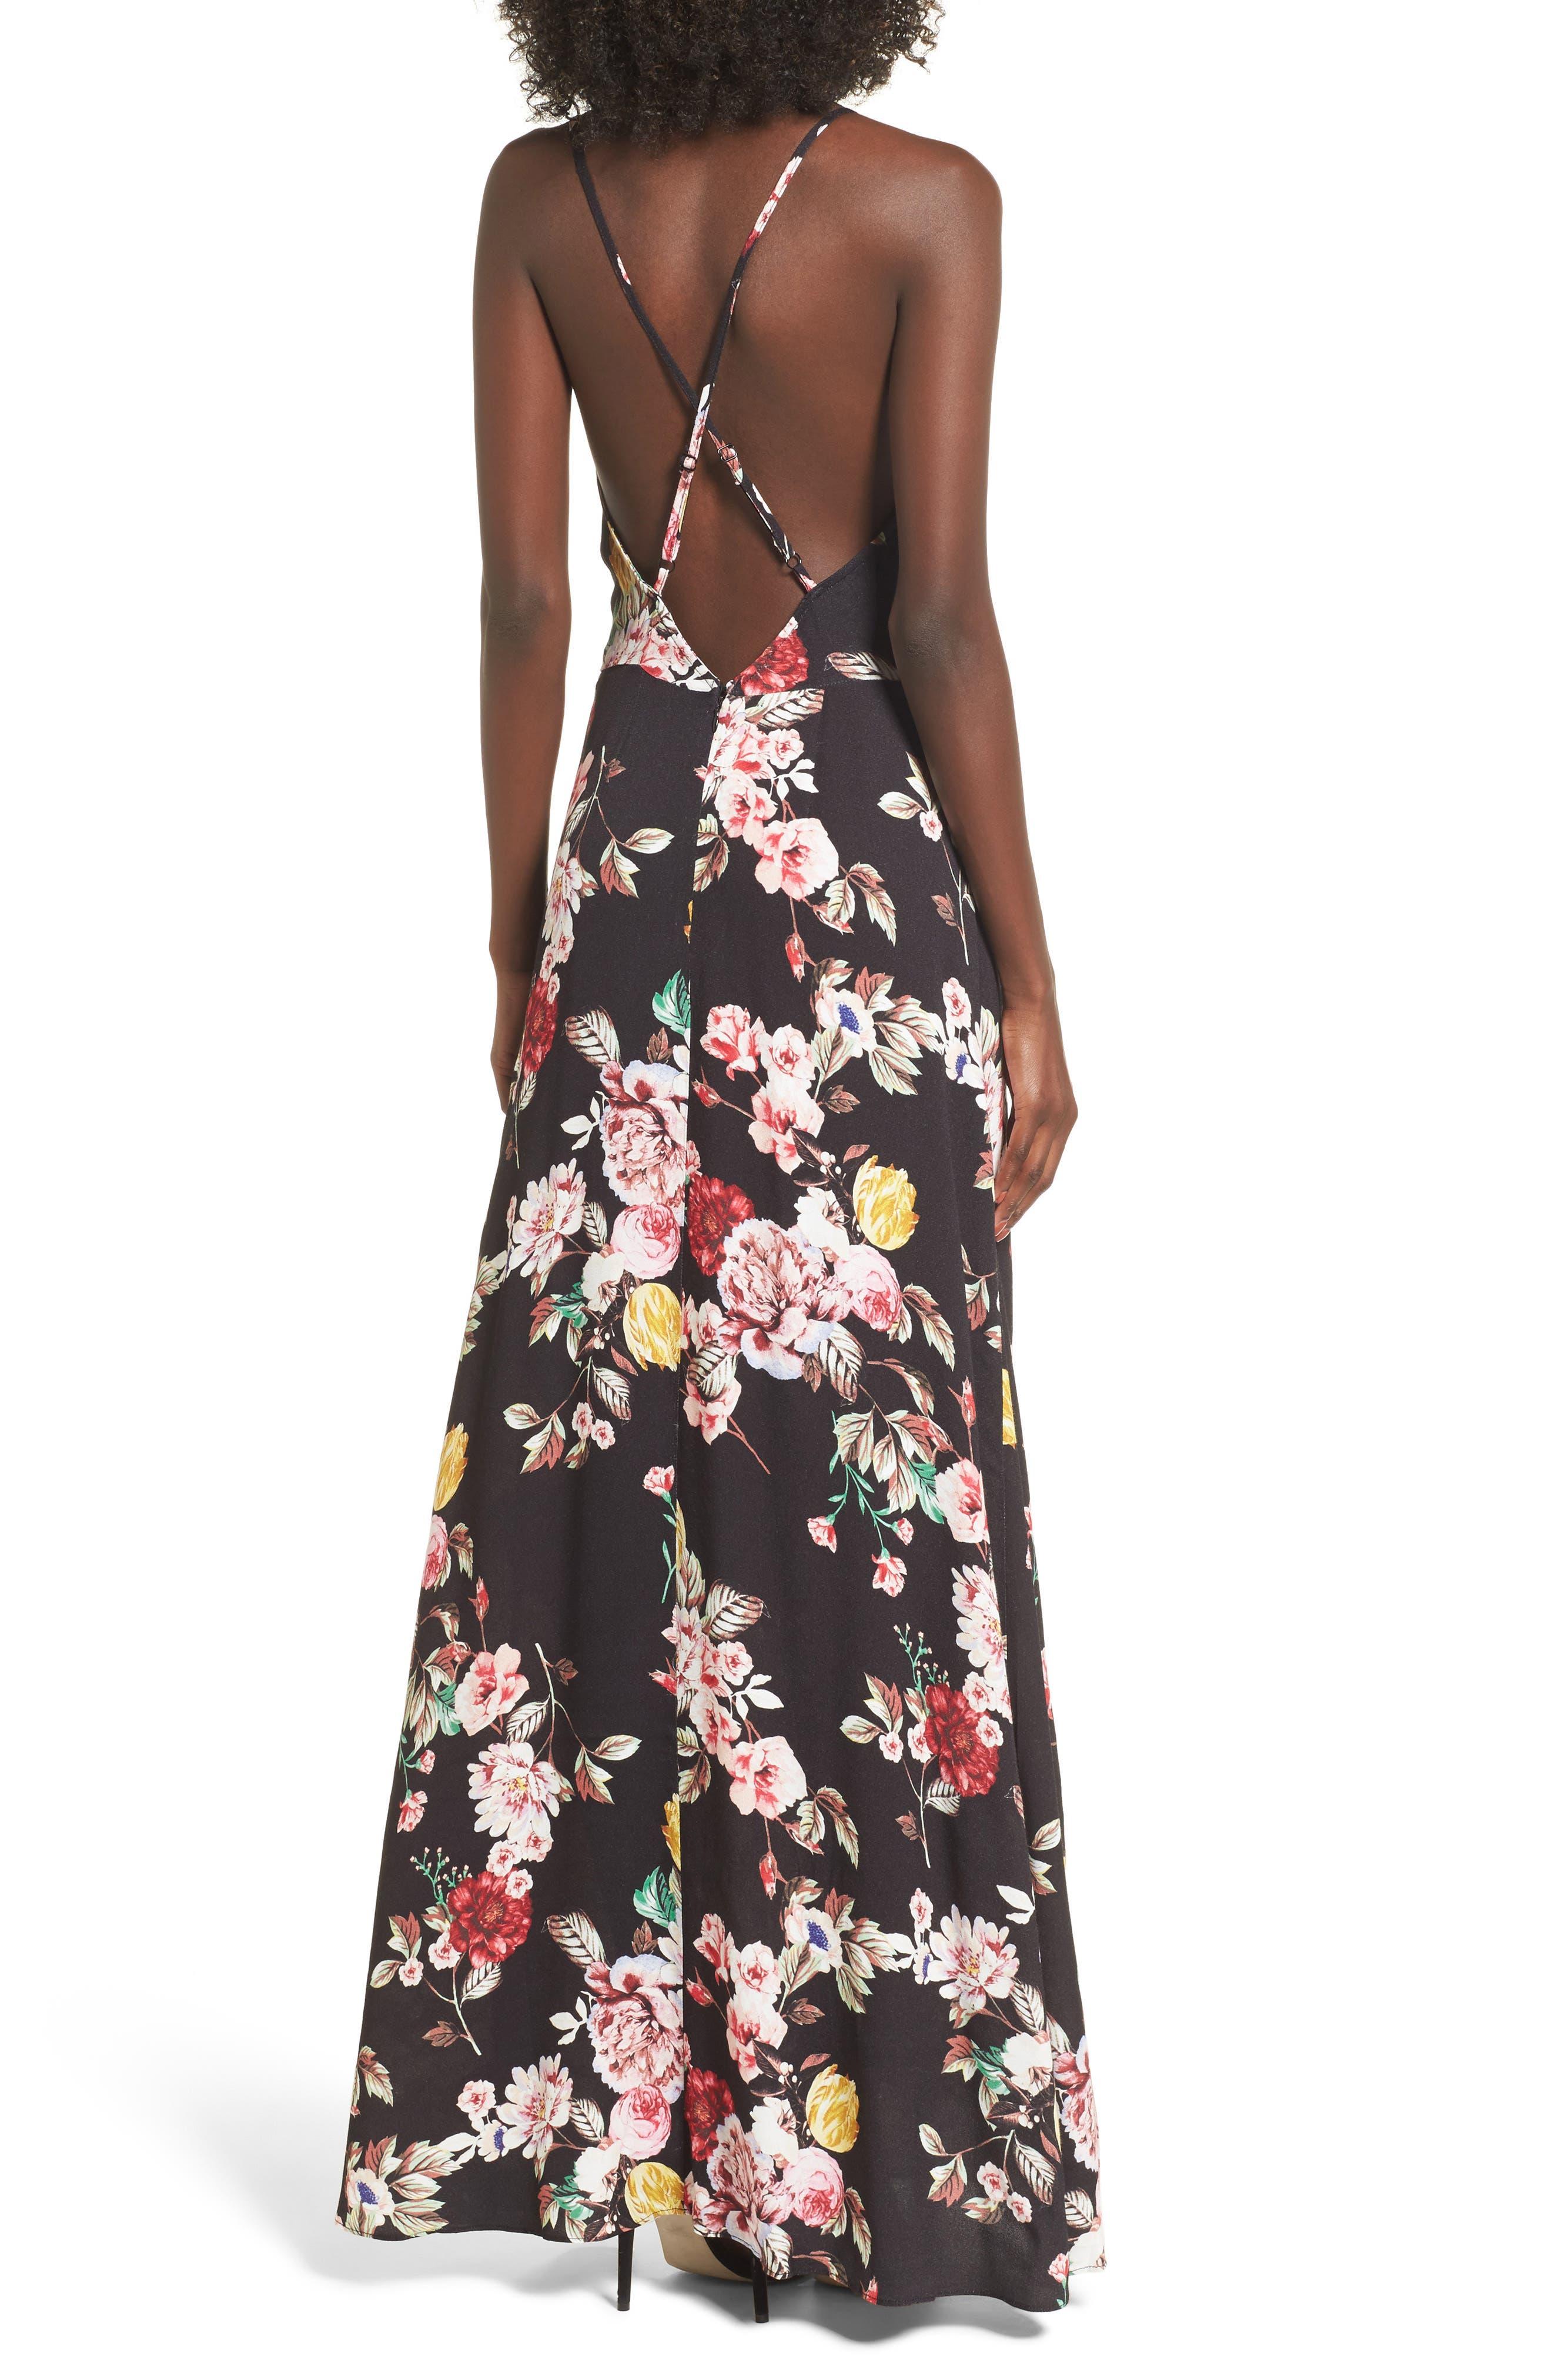 Kinsely Faux-Wrap Maxi Dress,                             Alternate thumbnail 2, color,                             002